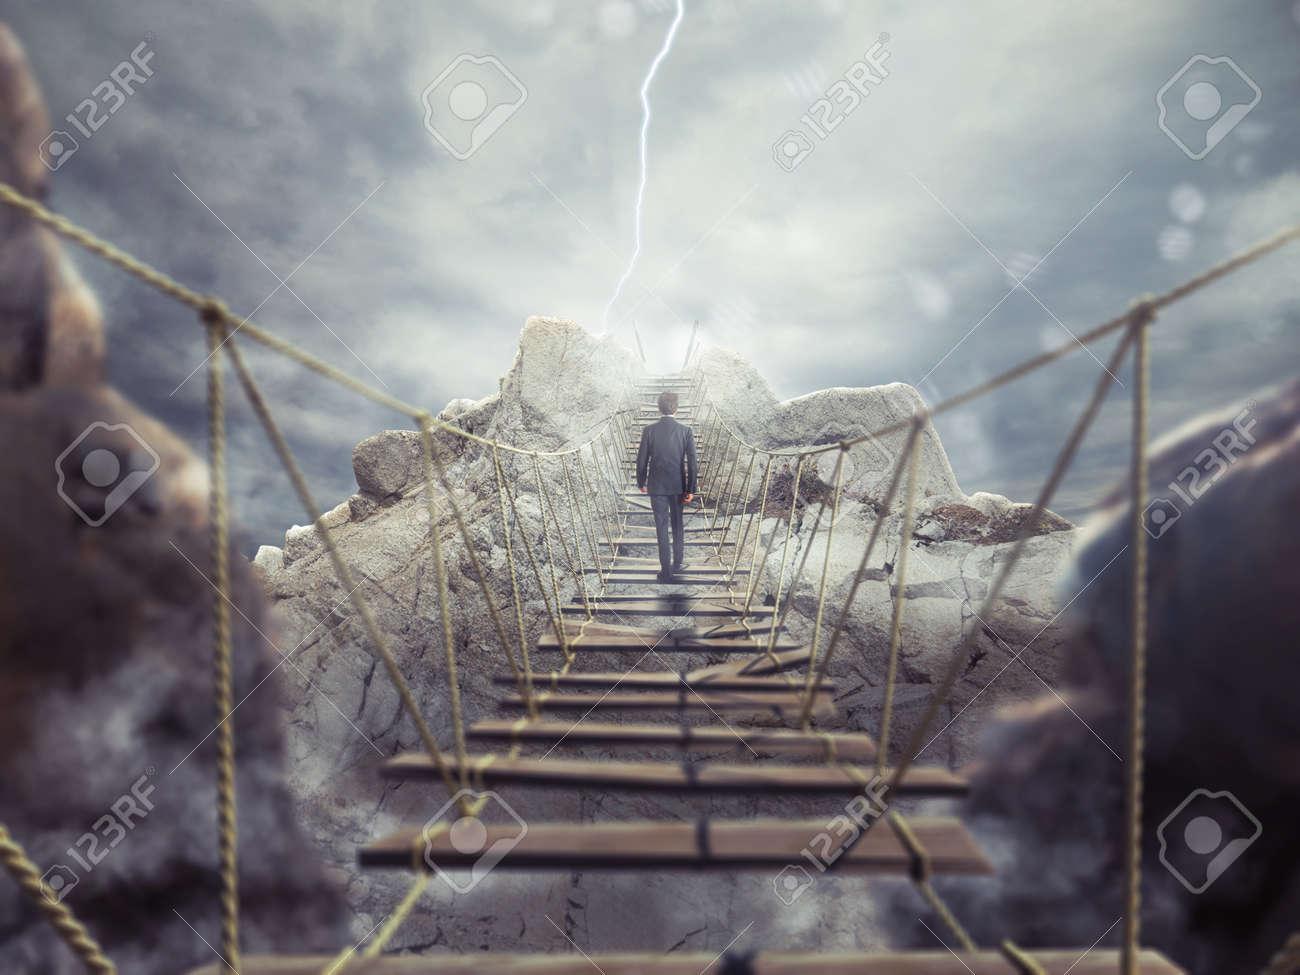 3D Rendering of man walks over a crumbling bridge - 58988787